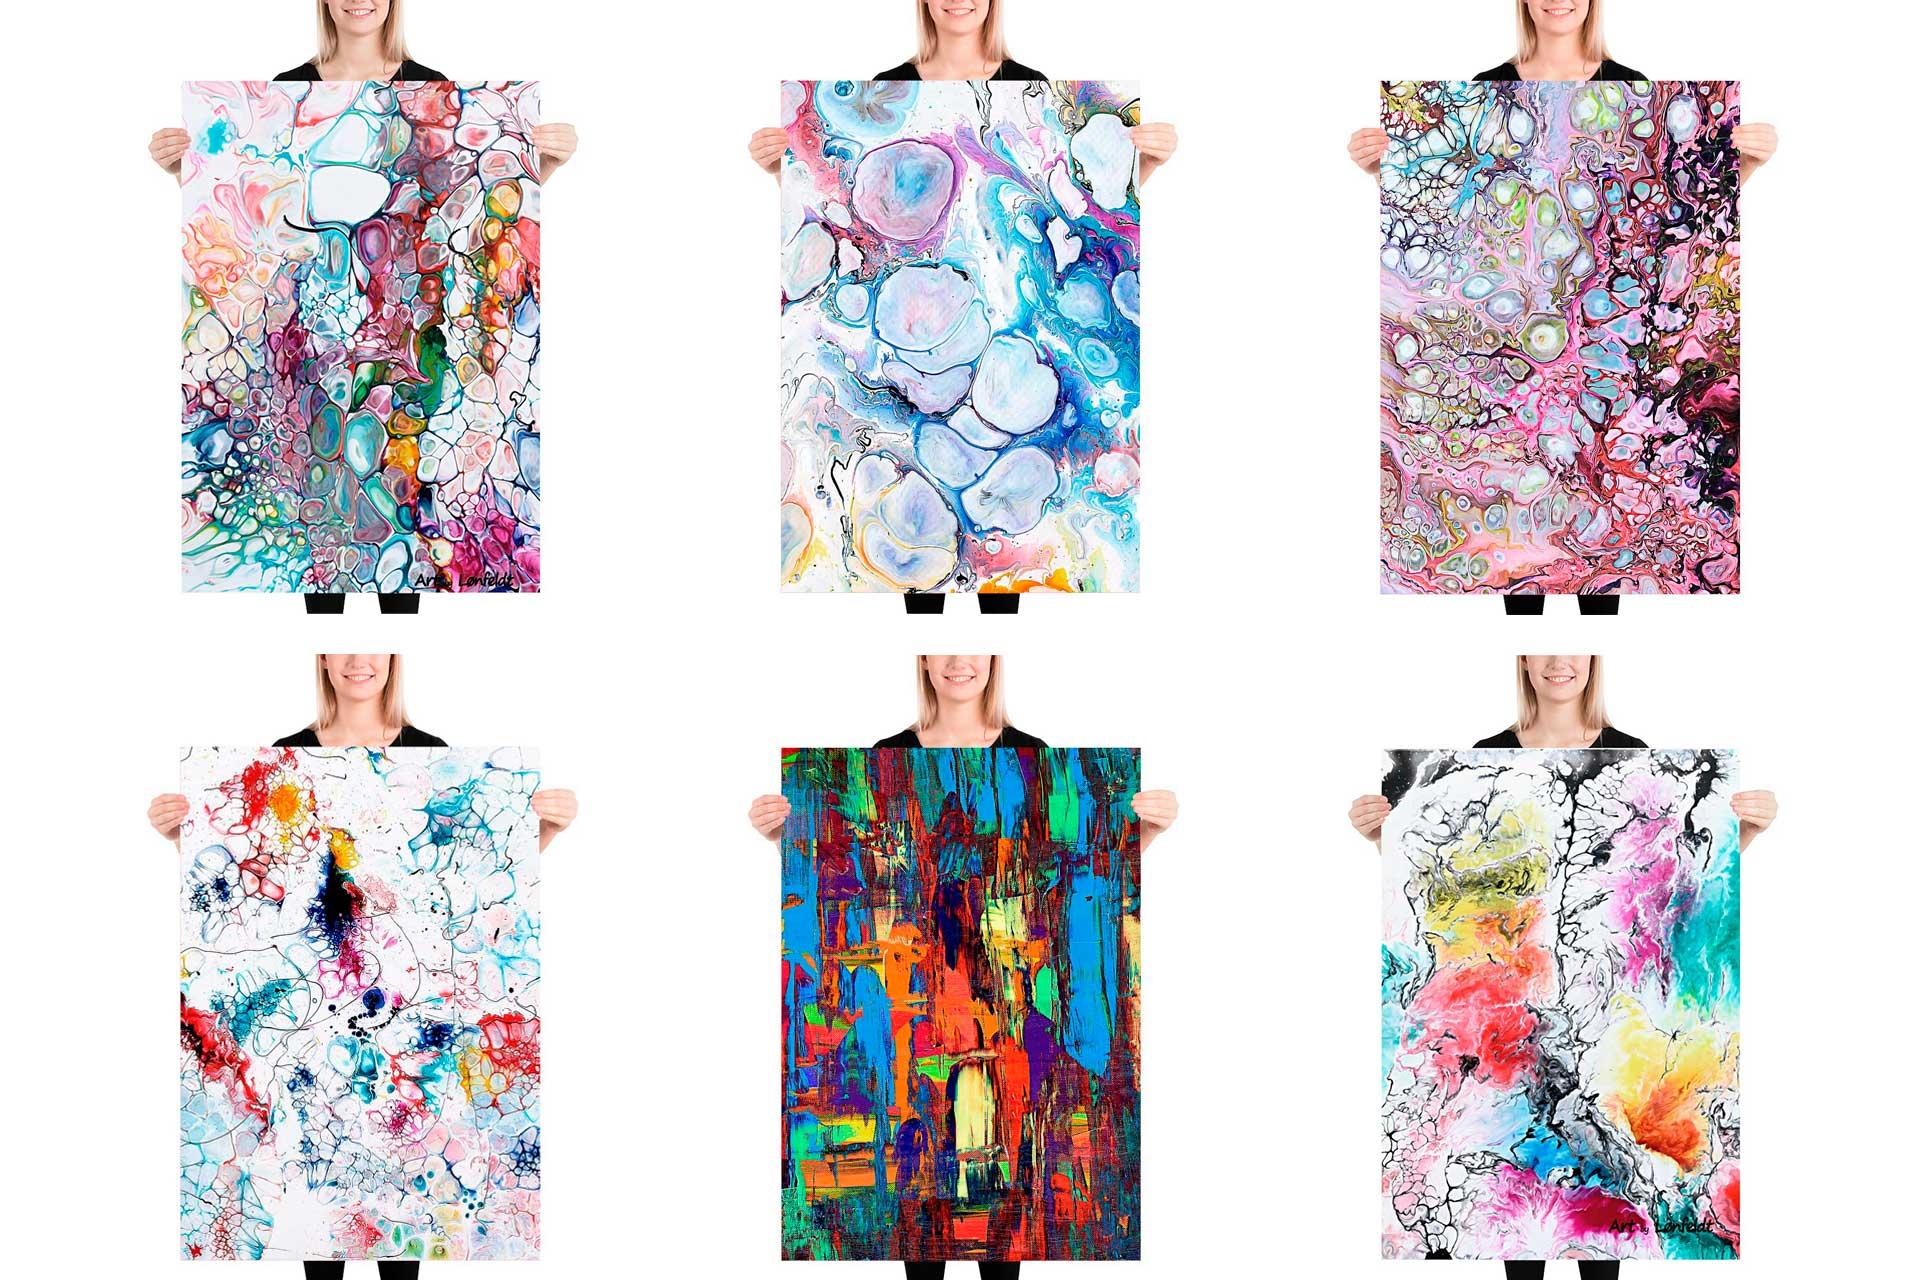 XXL Poster Wandposter Kunstposter Artposter Fine Art Prints online kaufen